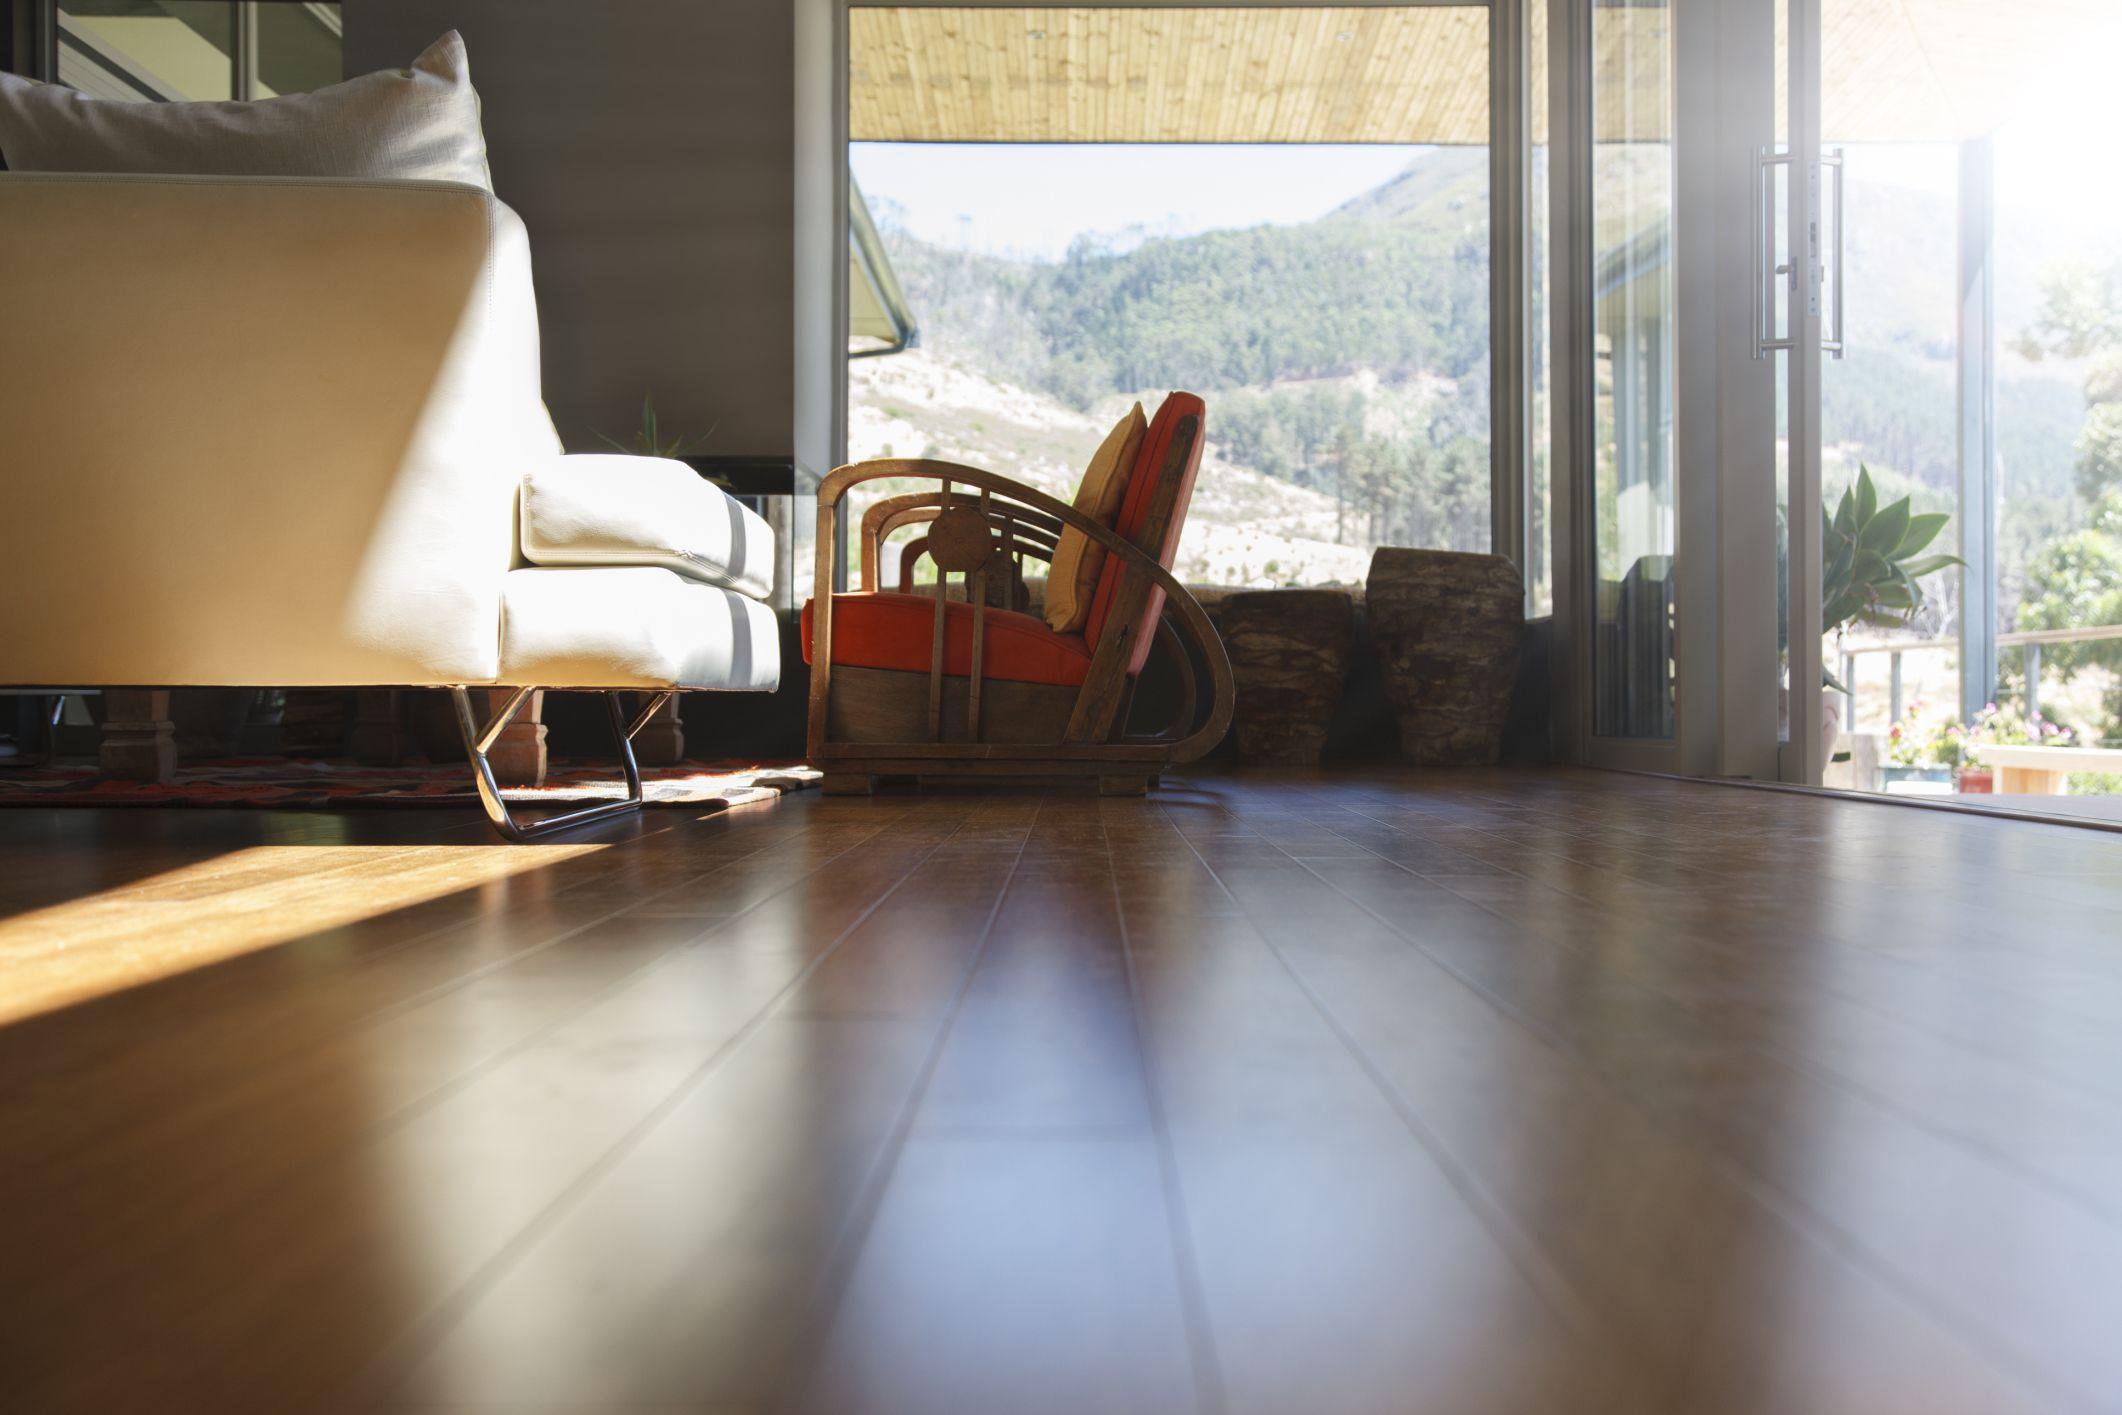 wholesale prefinished hardwood flooring of pros and cons of bellawood flooring from lumber liquidators regarding exotic hardwood flooring 525439899 56a49d3a3df78cf77283453d